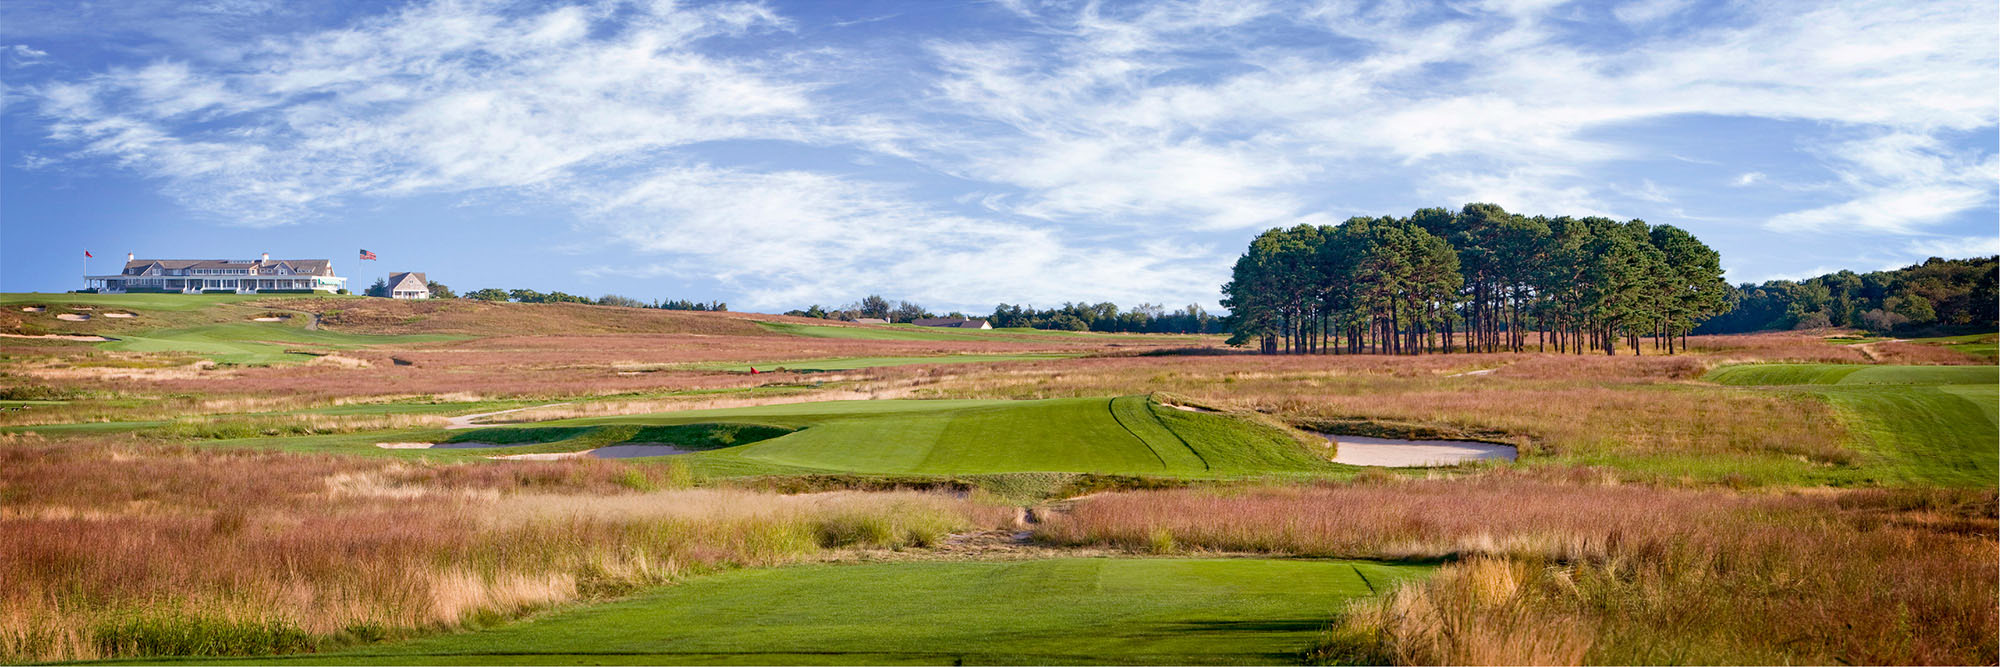 Golf Course Image - Shinnecock Hills Golf Club No. 7